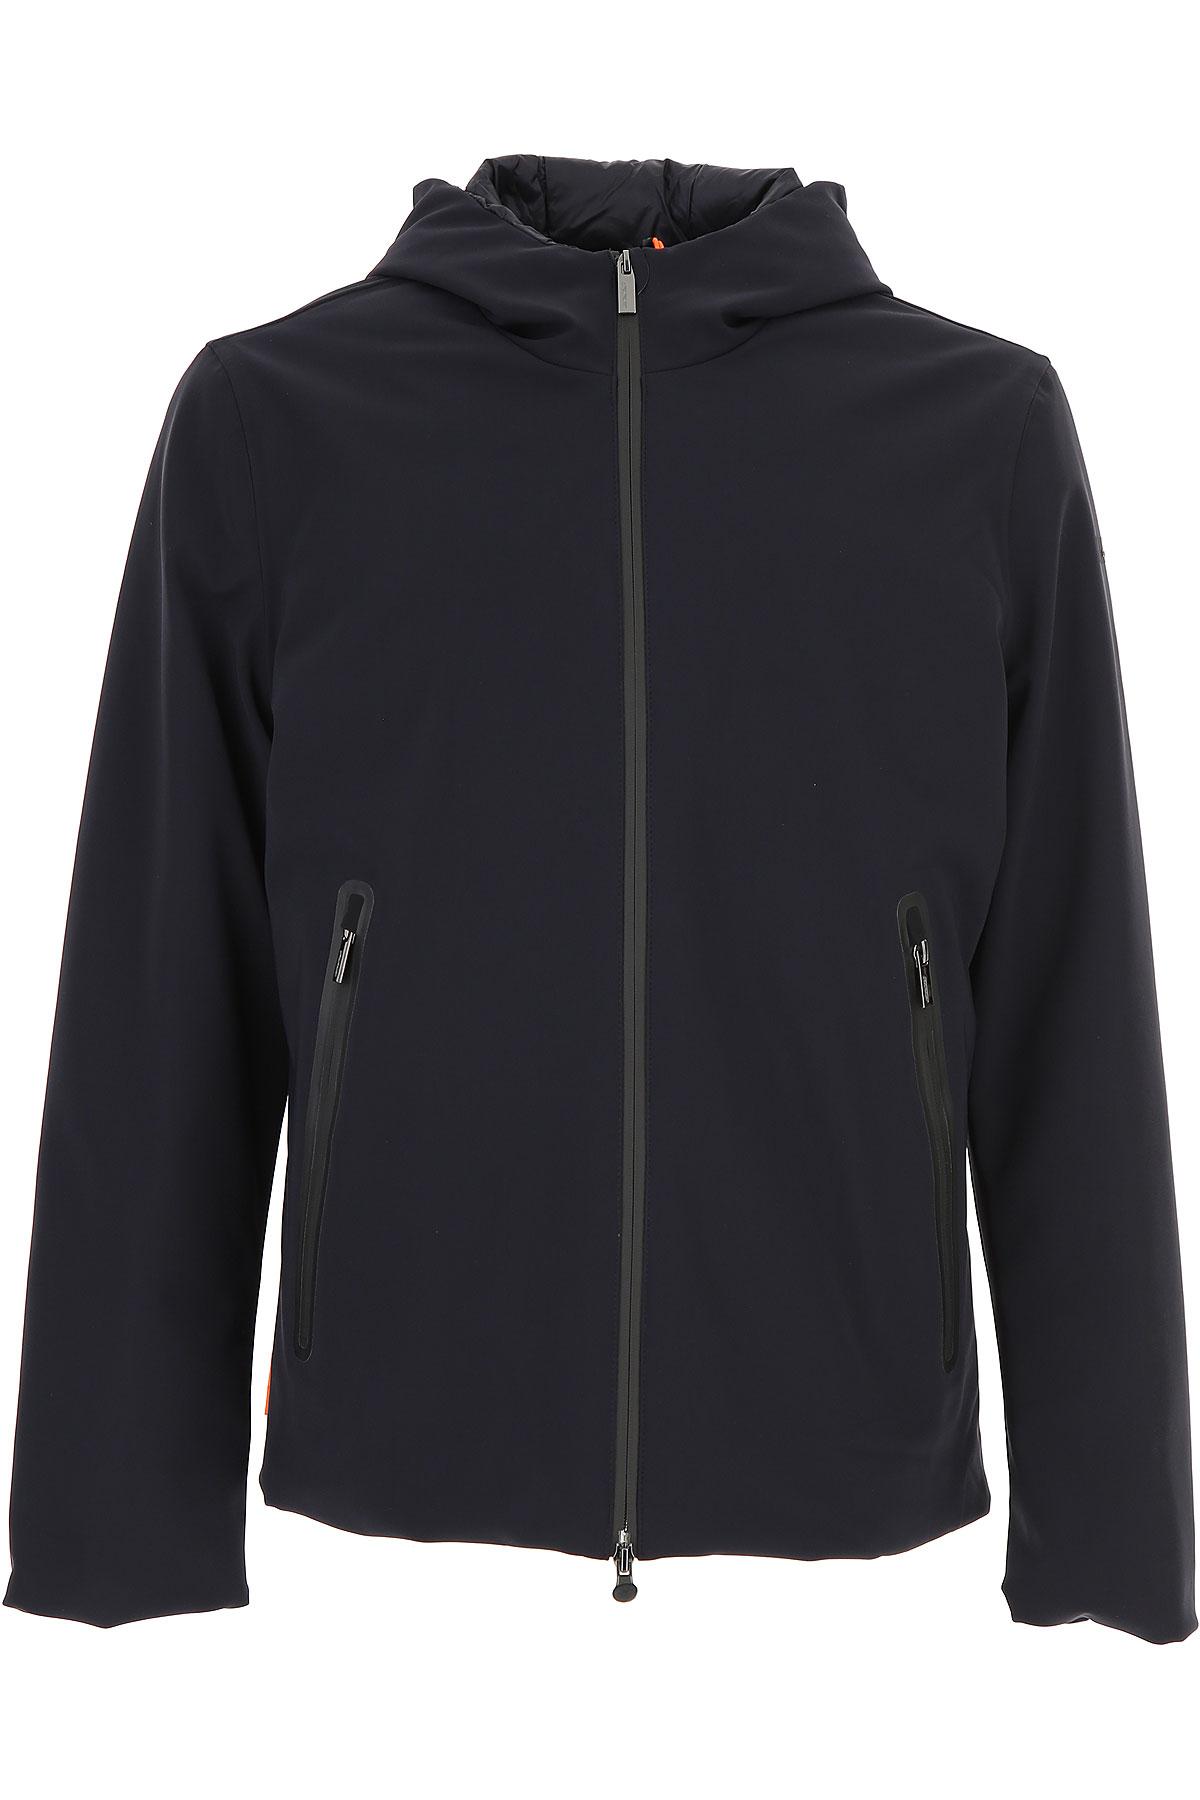 Image of RRD Down Jacket for Men, Puffer Ski Jacket, Blue Ink, polyamide, 2017, L M S XL XXL XXXL